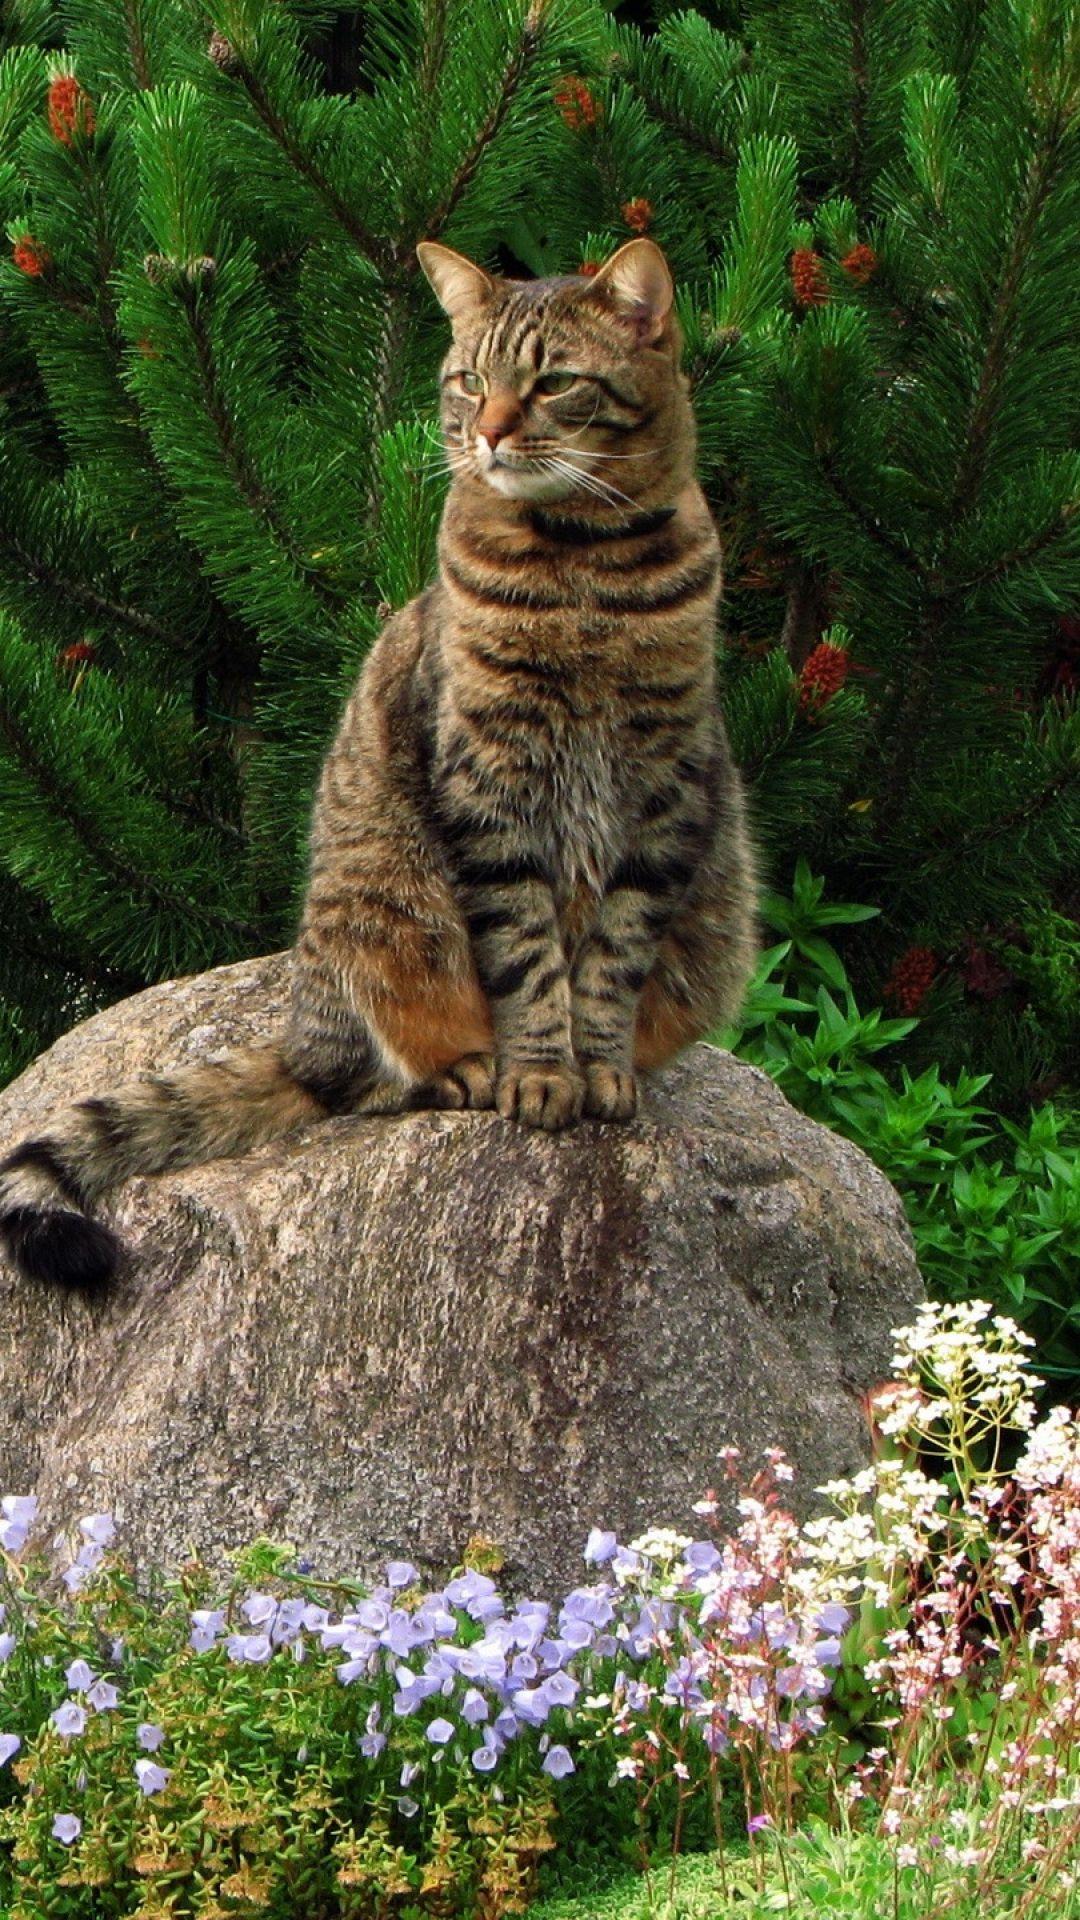 cat, grass, flowers, garden, rock, sitting, landscape